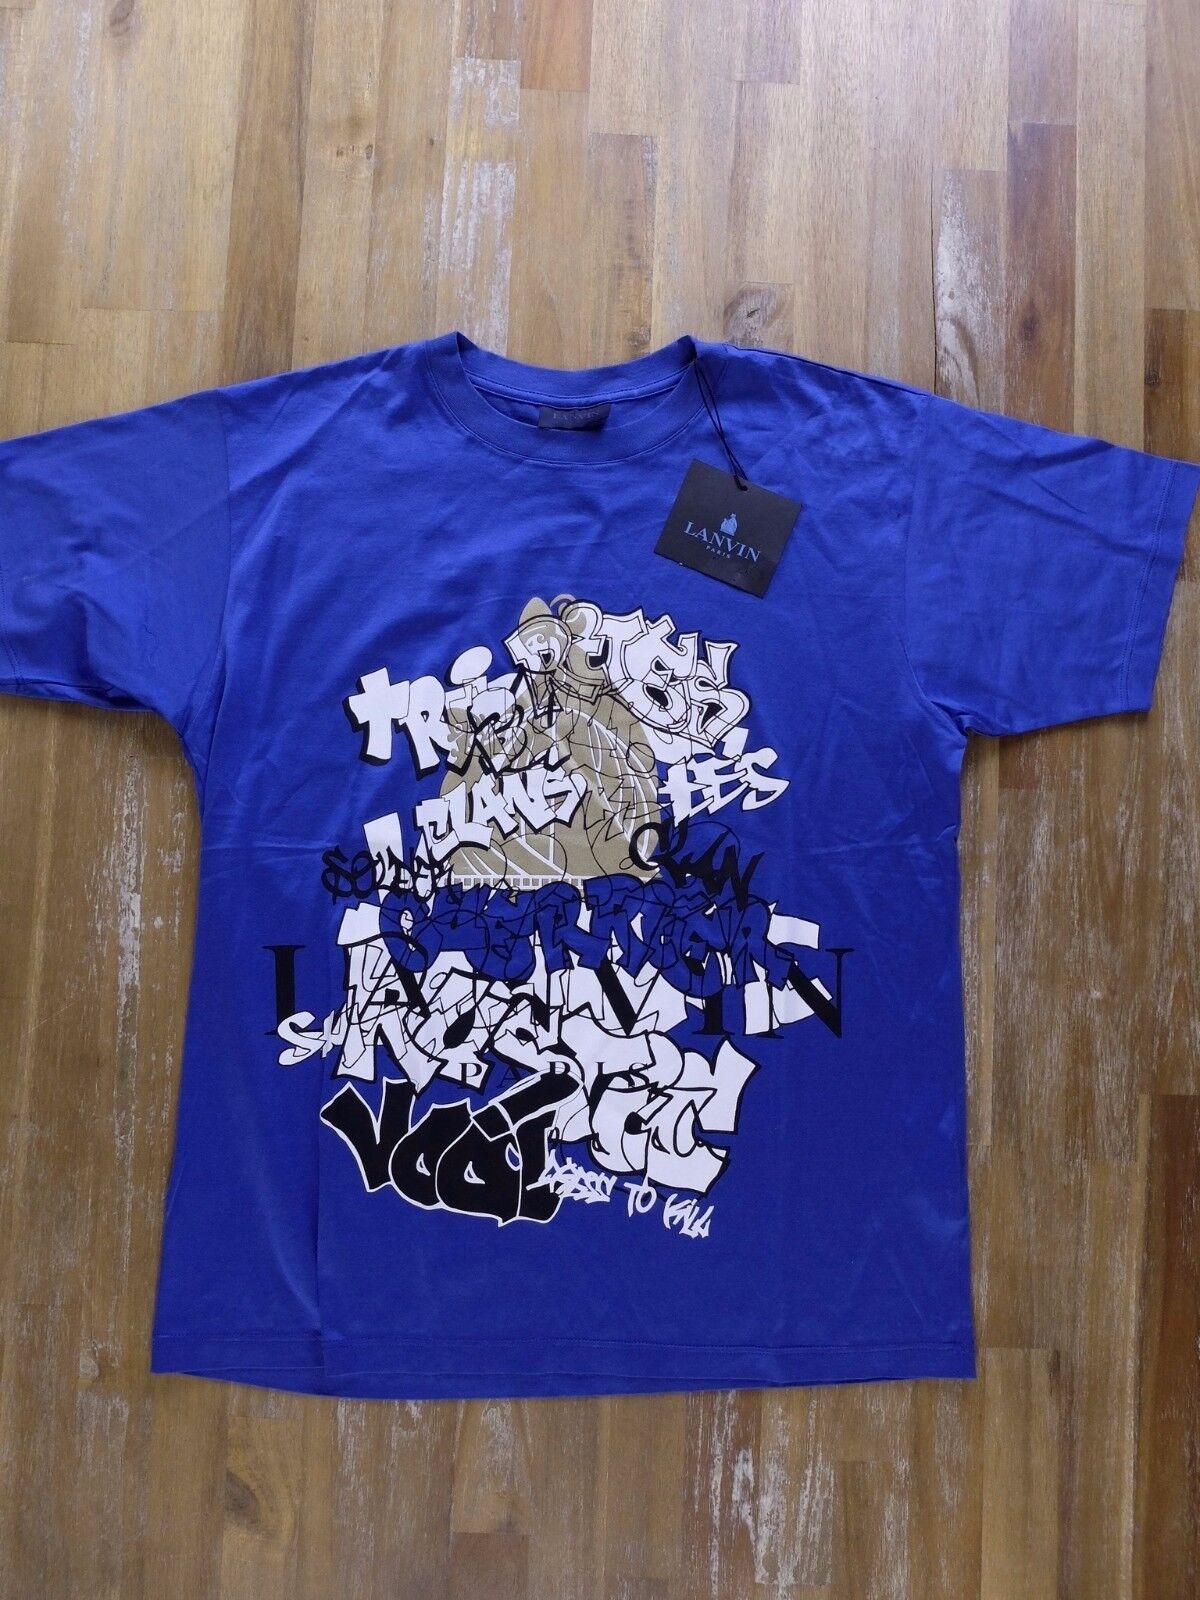 LANVIN Paris Blau logo print t-shirt authentic - Größe XS - NWT